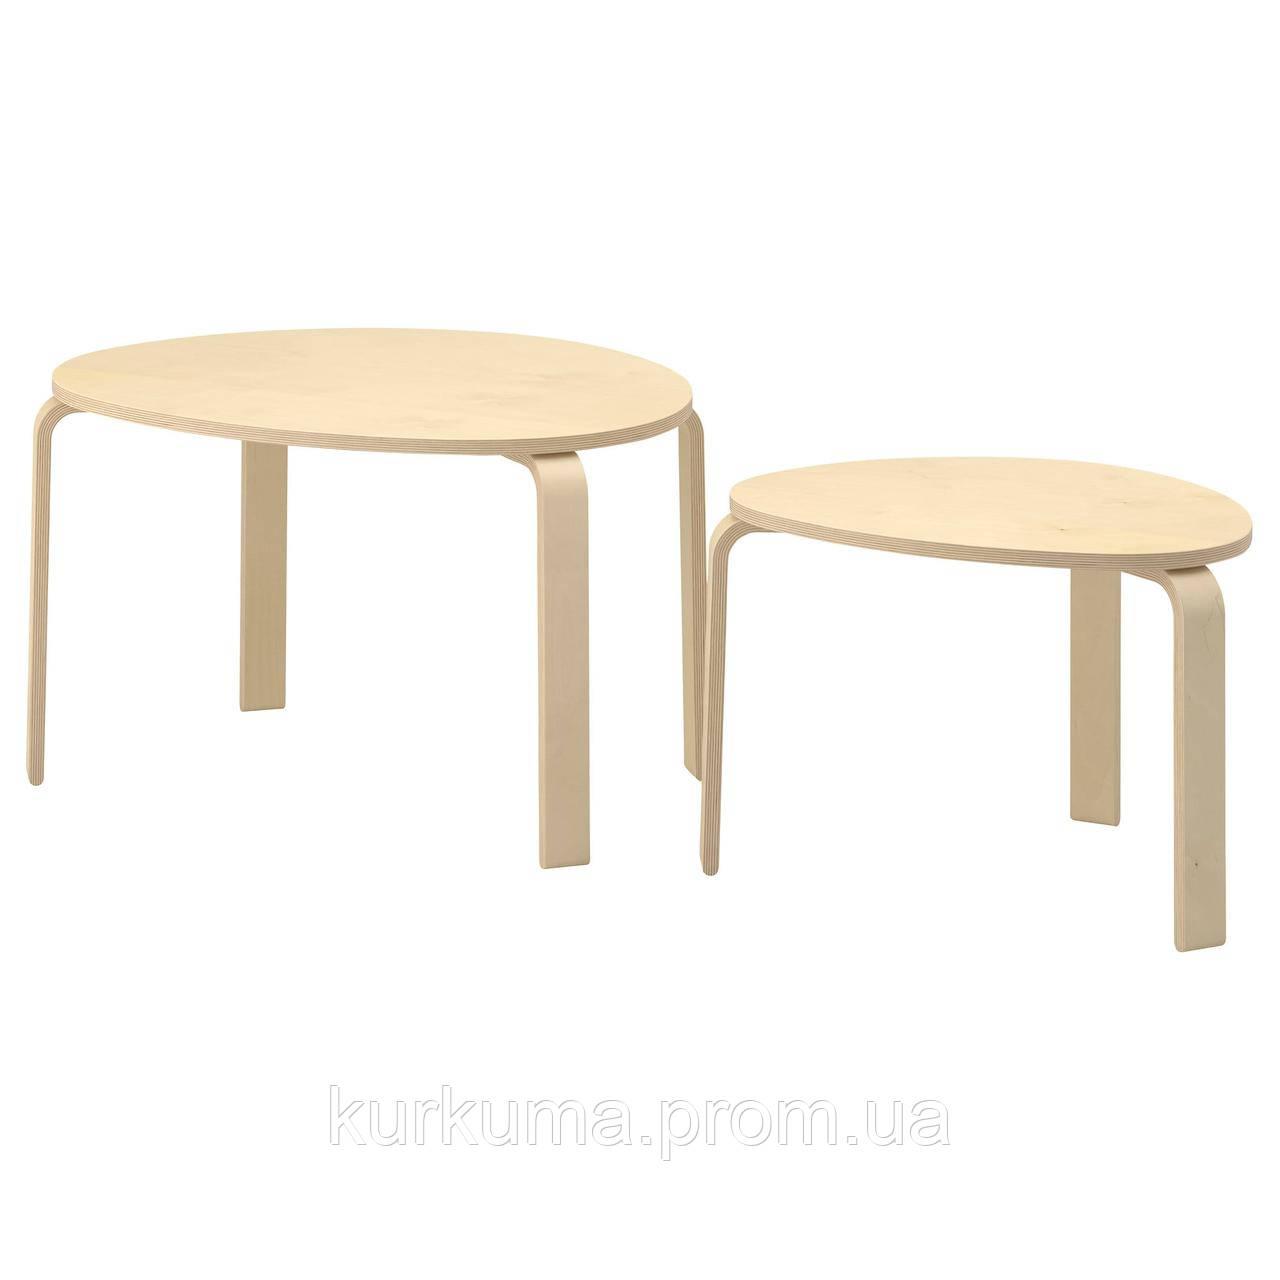 IKEA SVALSTA Стол 2 шт., березовый шпон  (802.806.76)